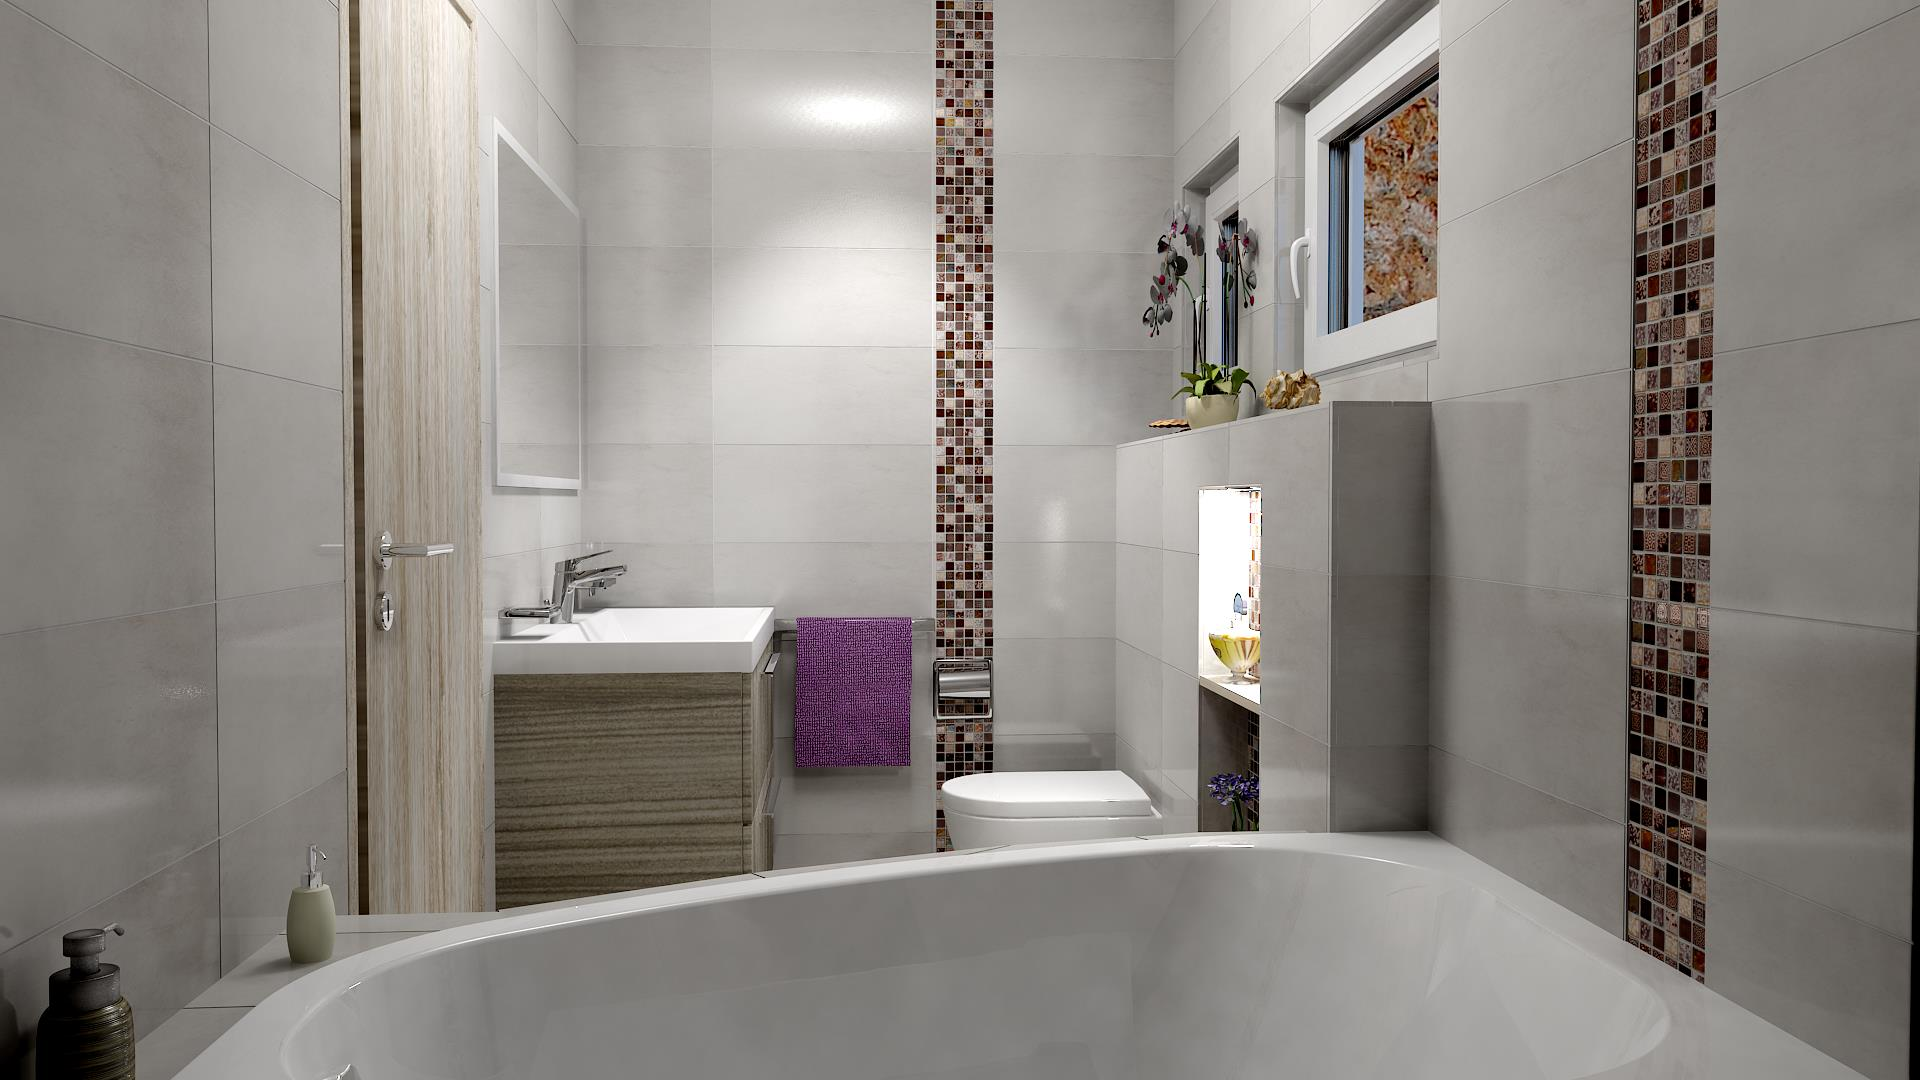 marmo d bathroom by sz p otthon p pa on visoft360 portal. Black Bedroom Furniture Sets. Home Design Ideas